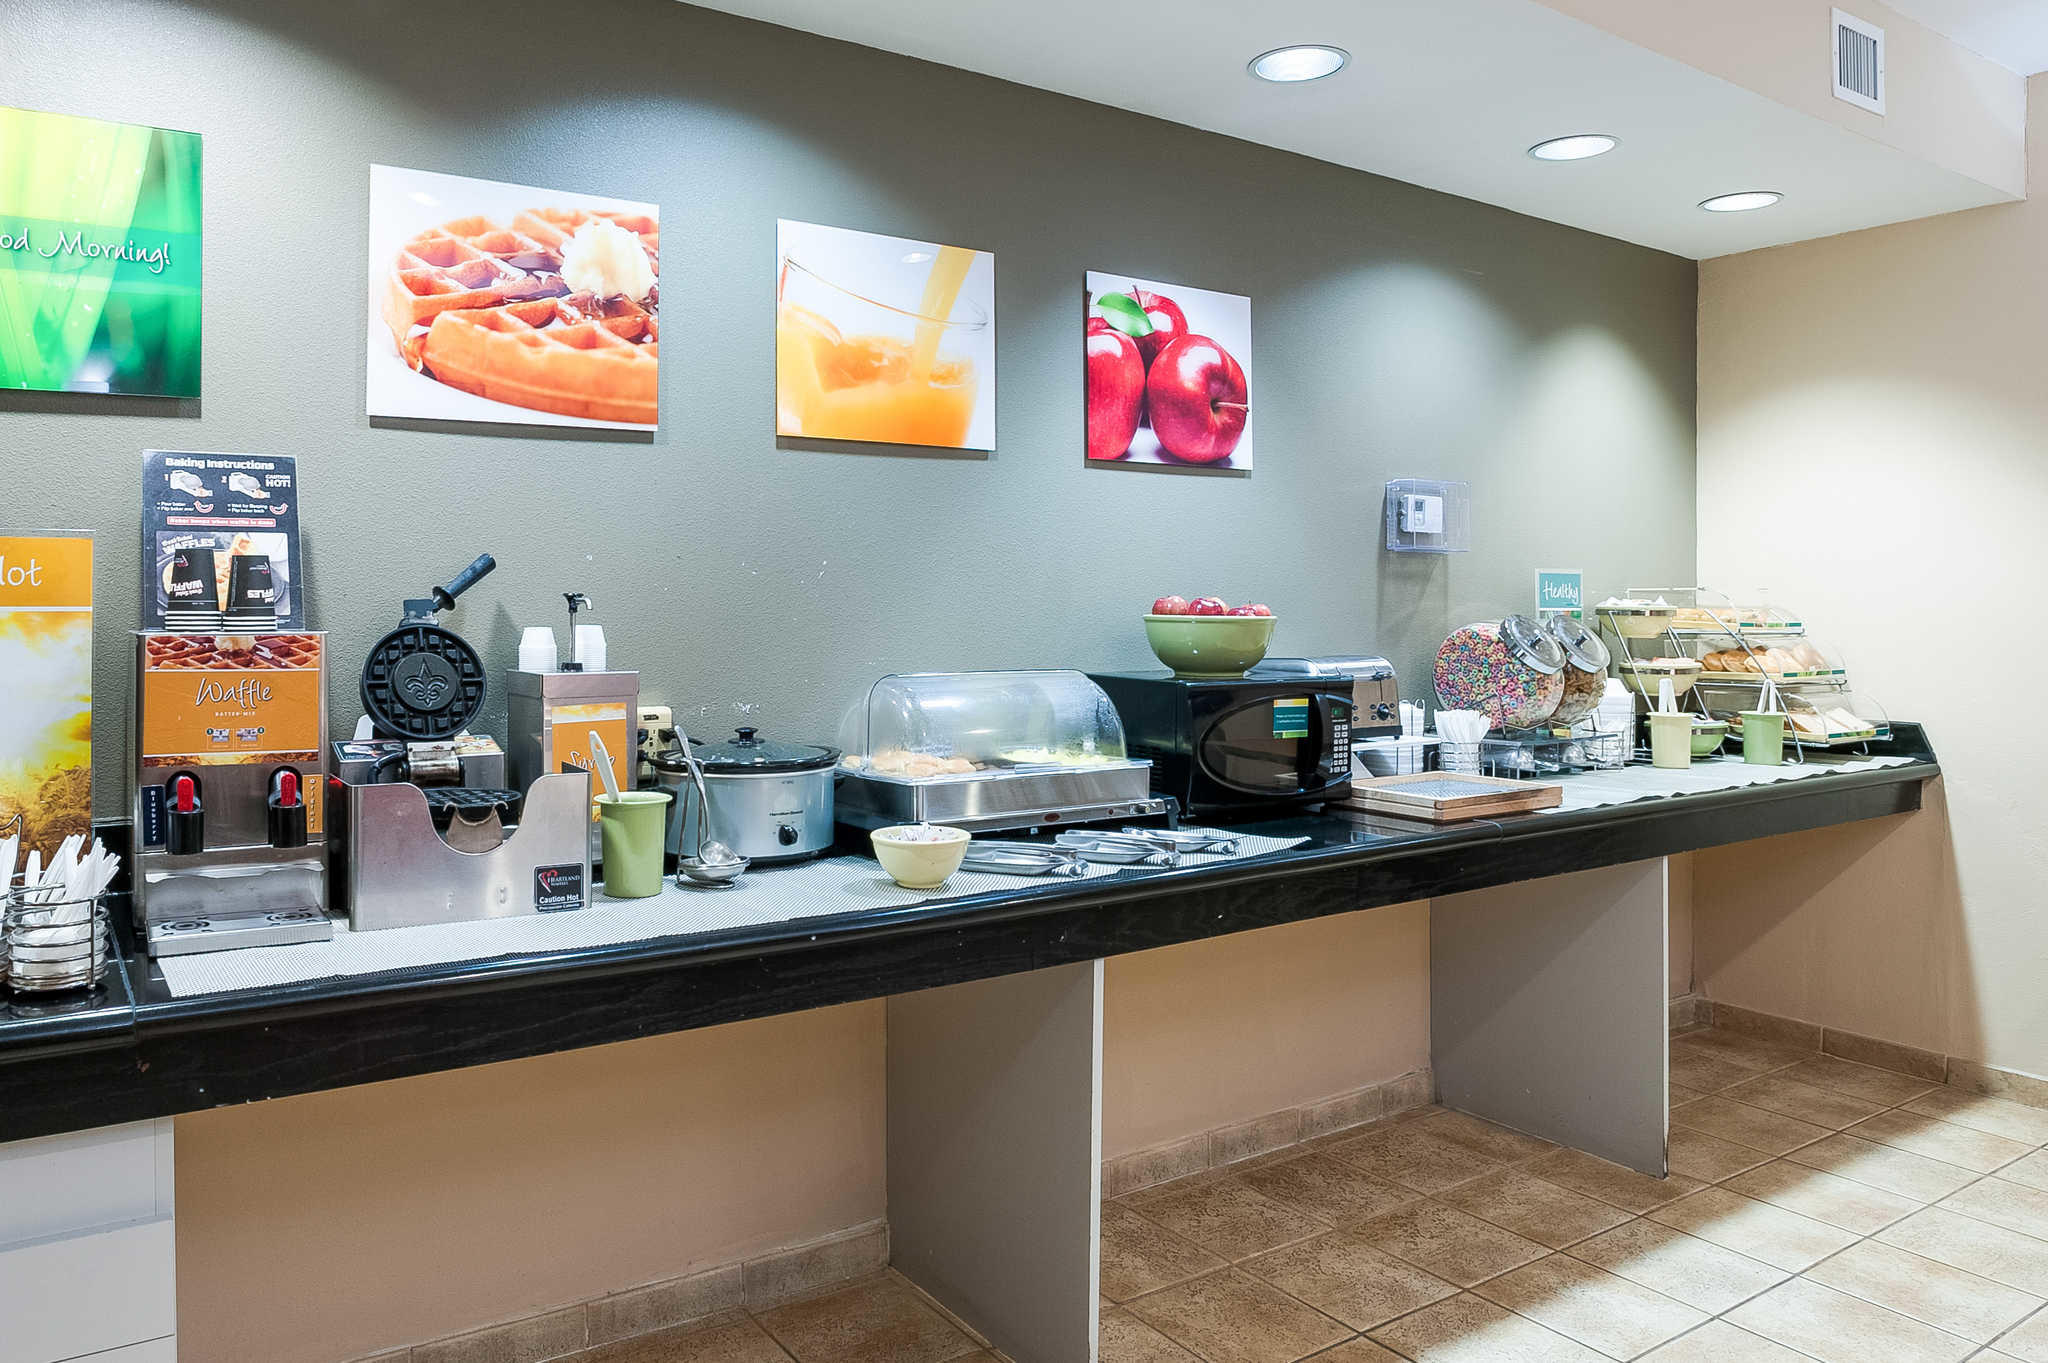 Quality Inn & Suites image 43